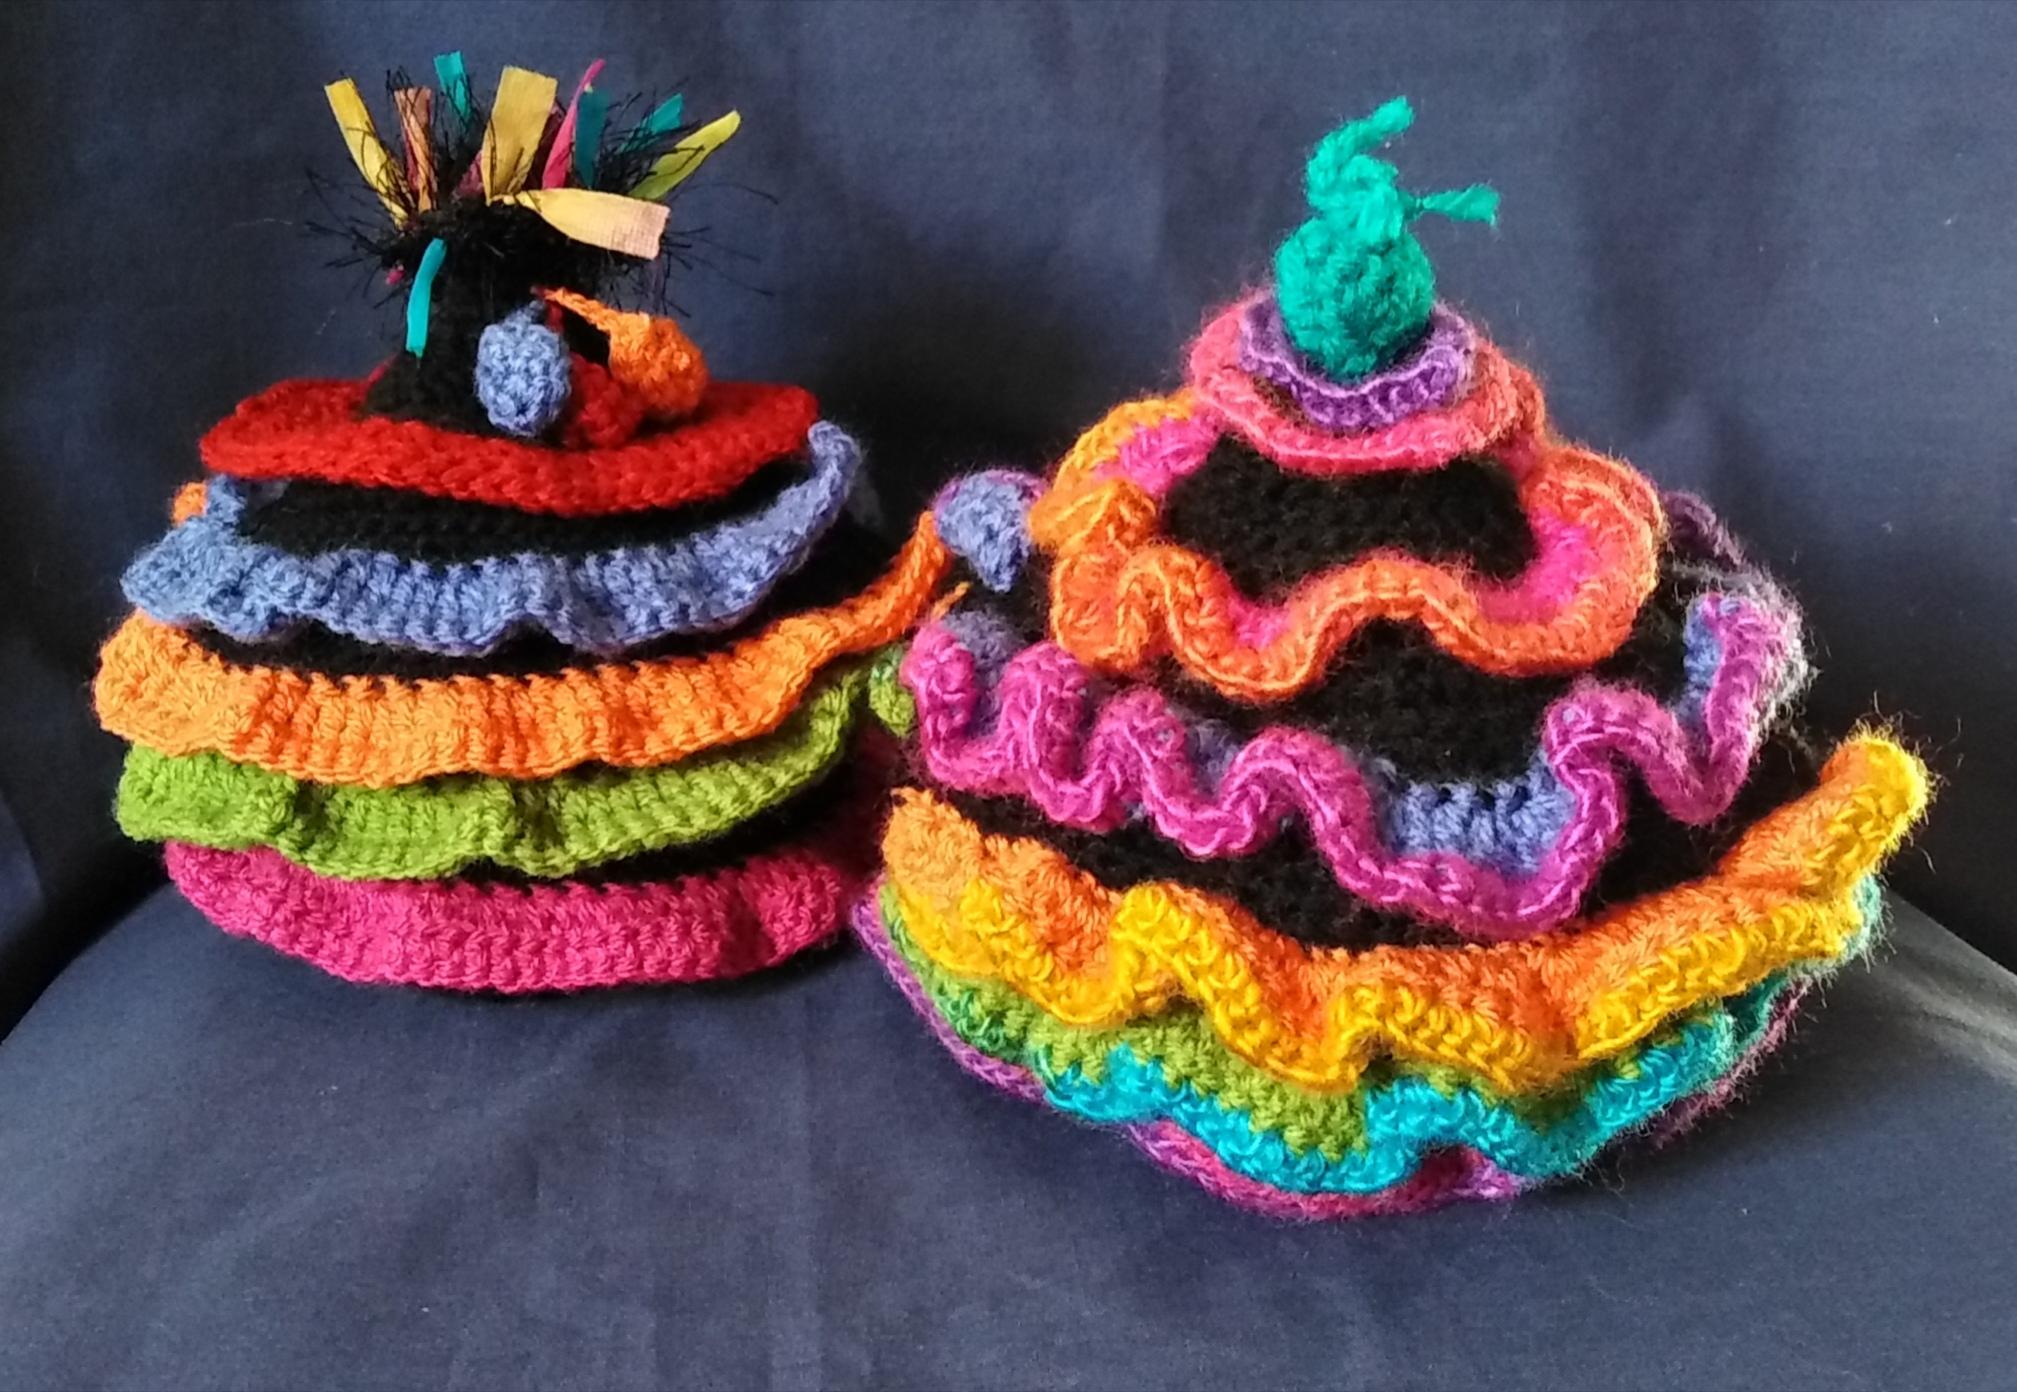 frilly tea cosies